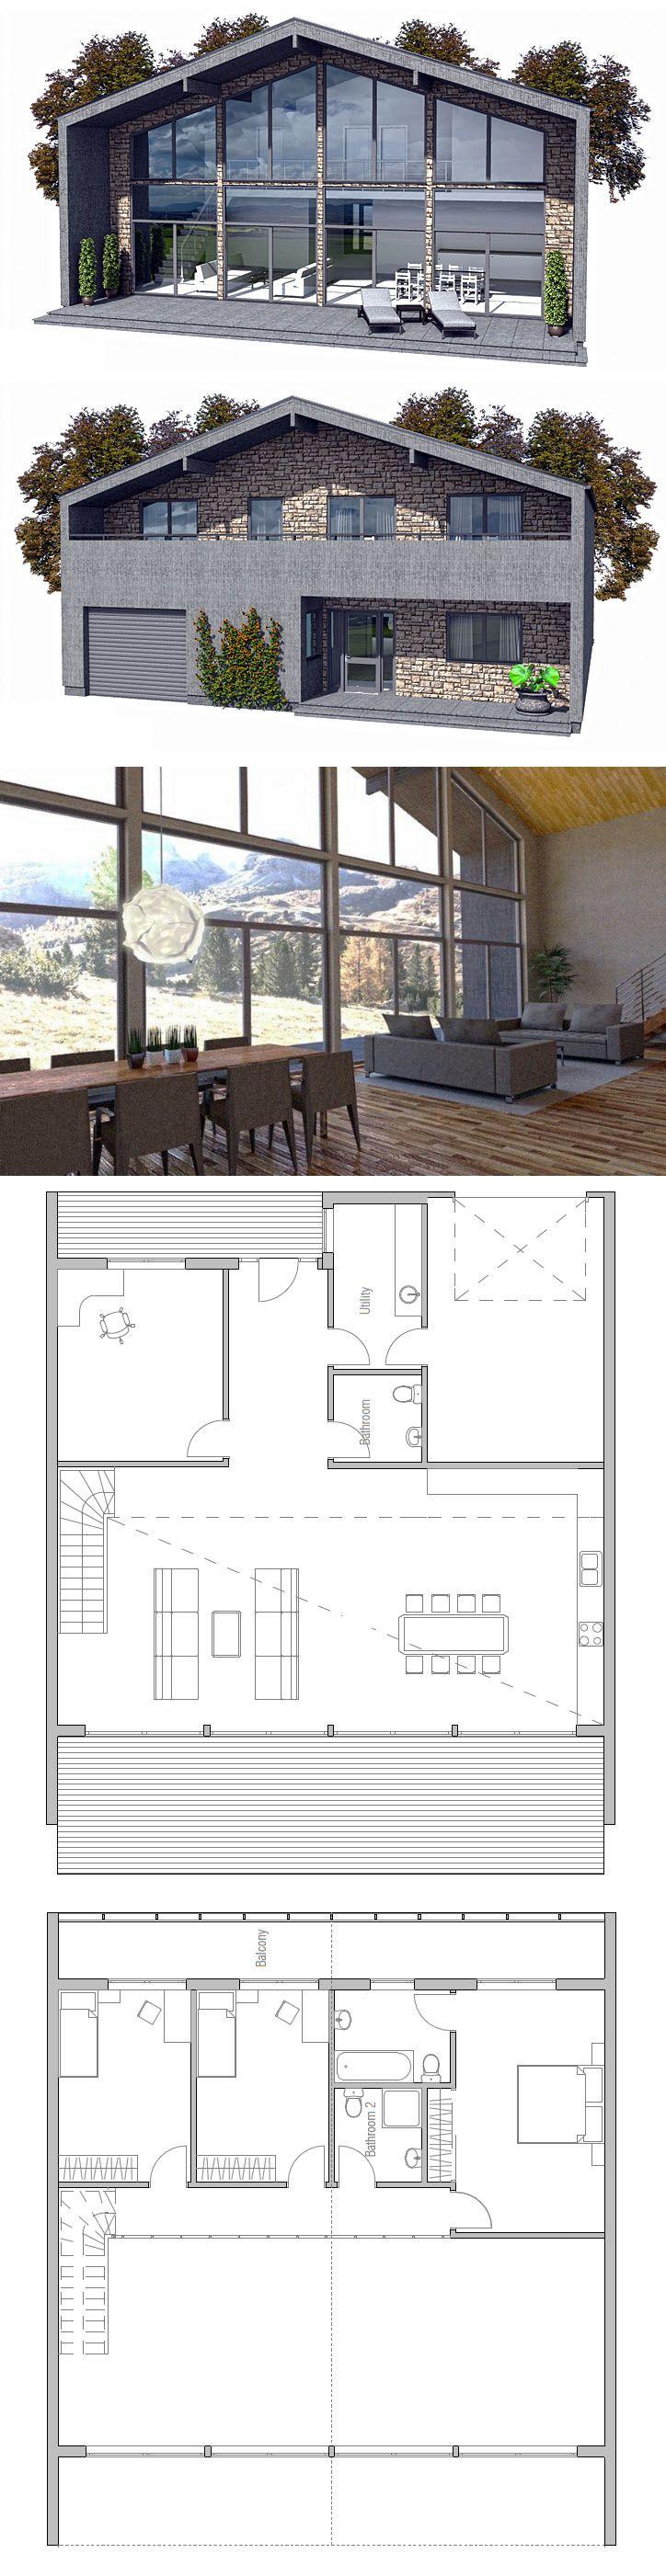 Home Plan Modular Home Plan Prefab house